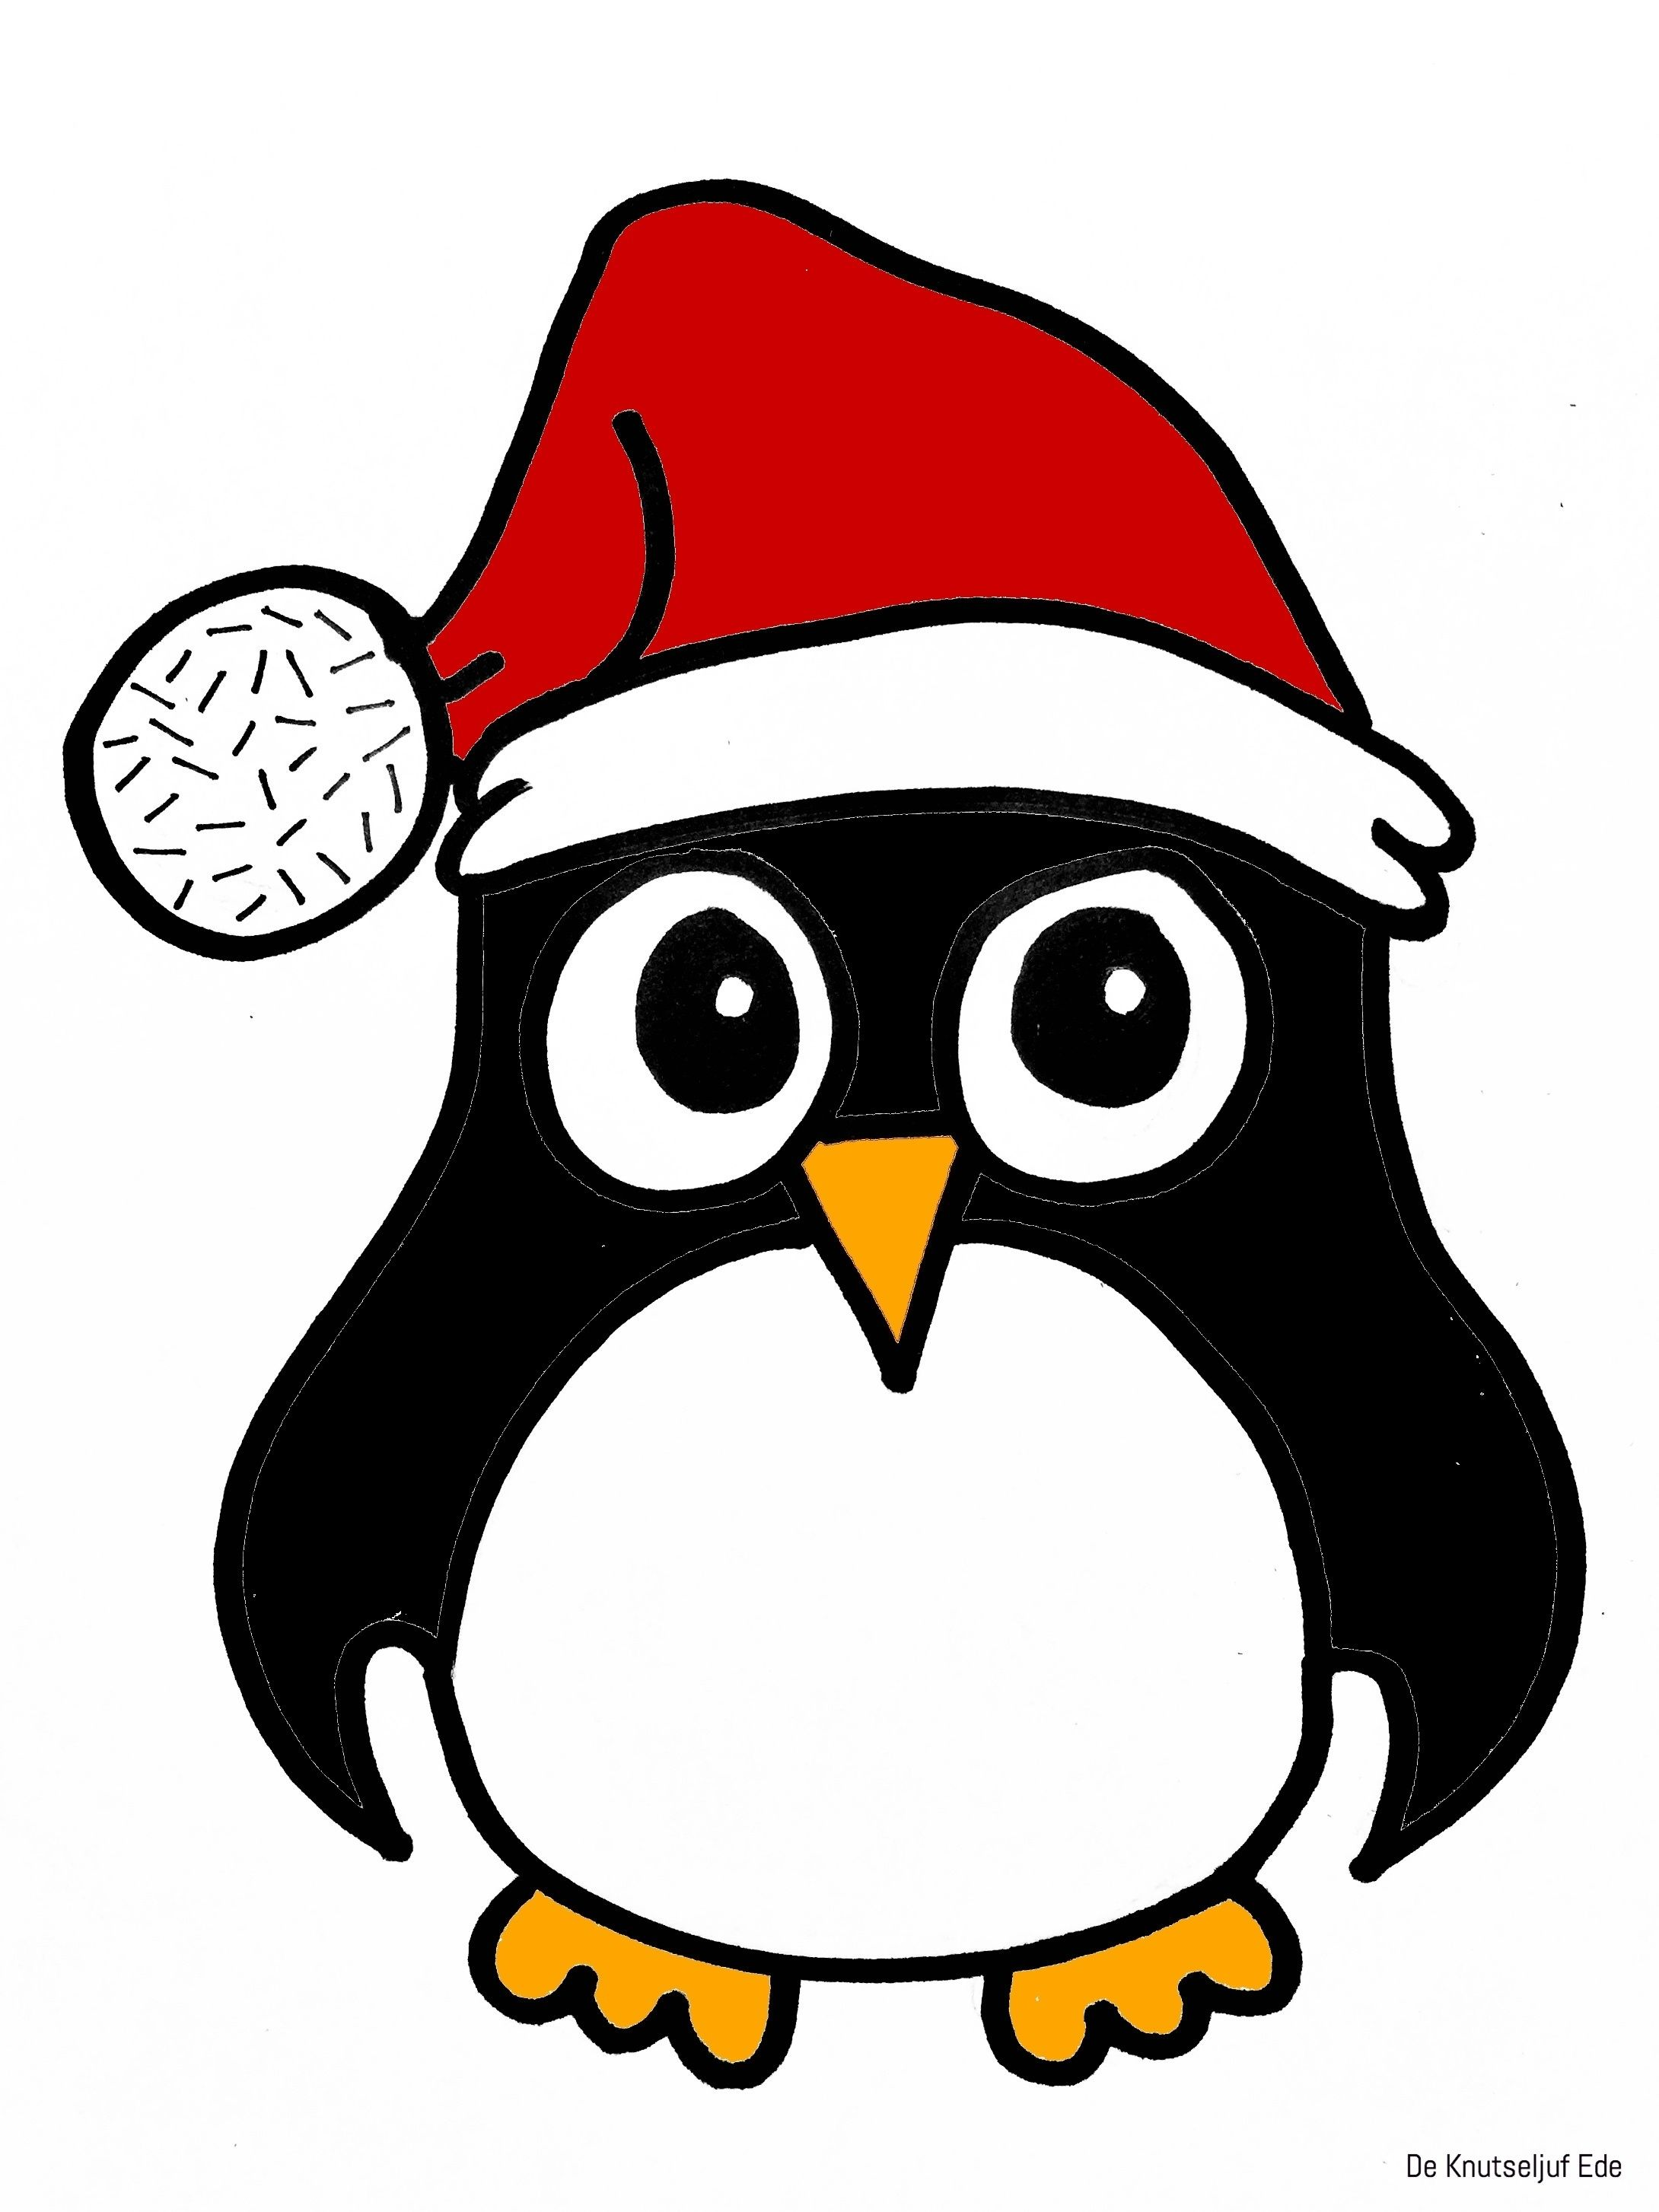 Kleurplaten Pinguins Kleurplaten De Knutseljuf Ede Pinguins Kleurplaten Winter Knutselen